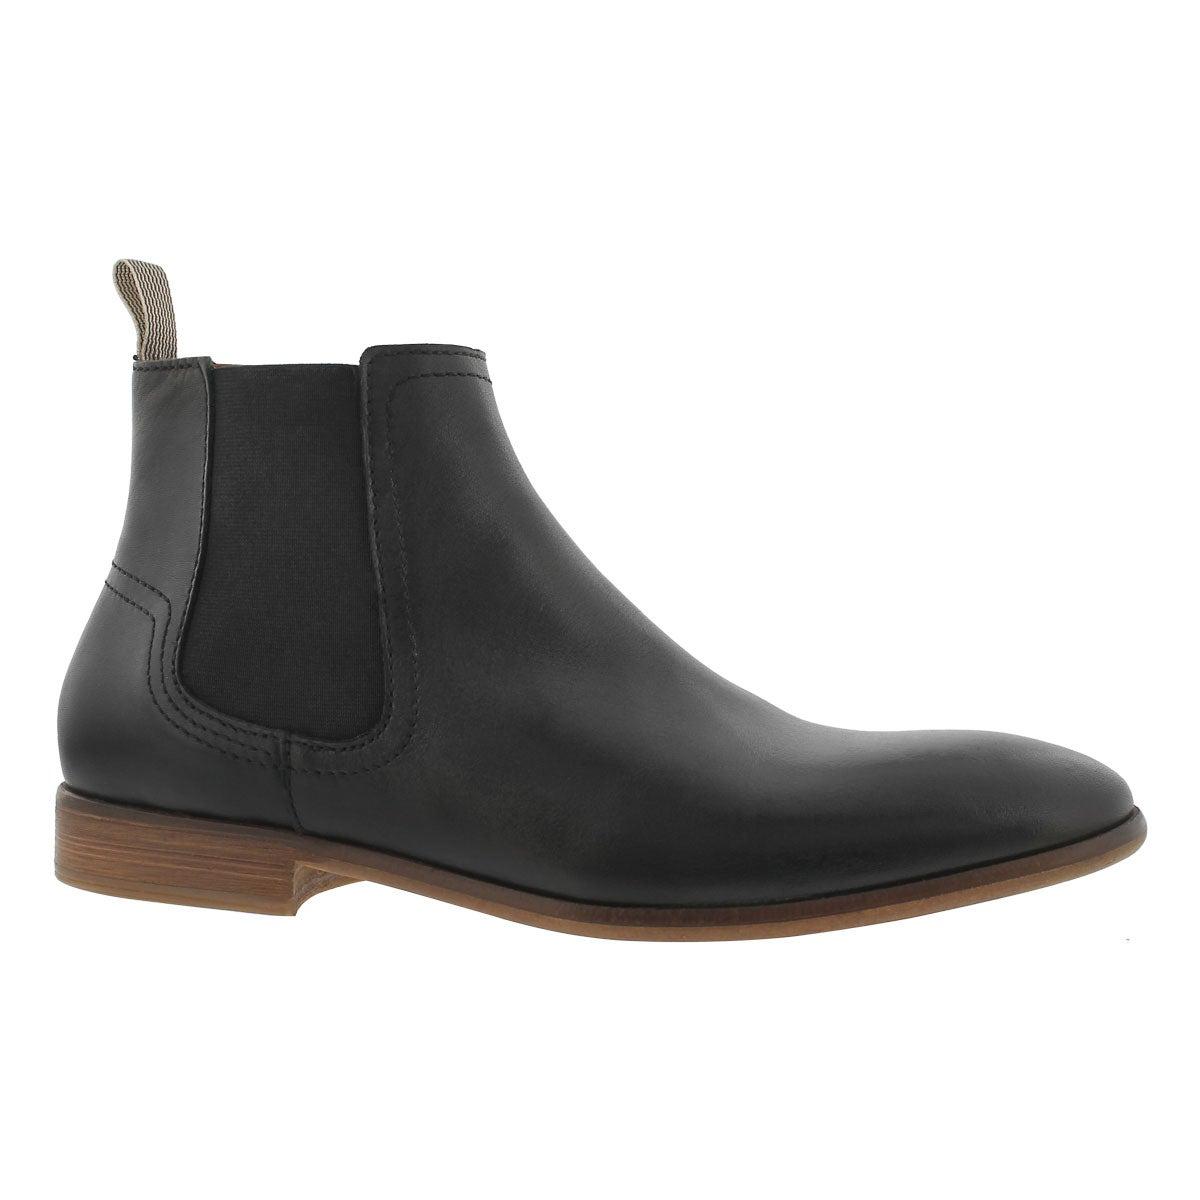 Men's MADSEN black slip on ankle boots